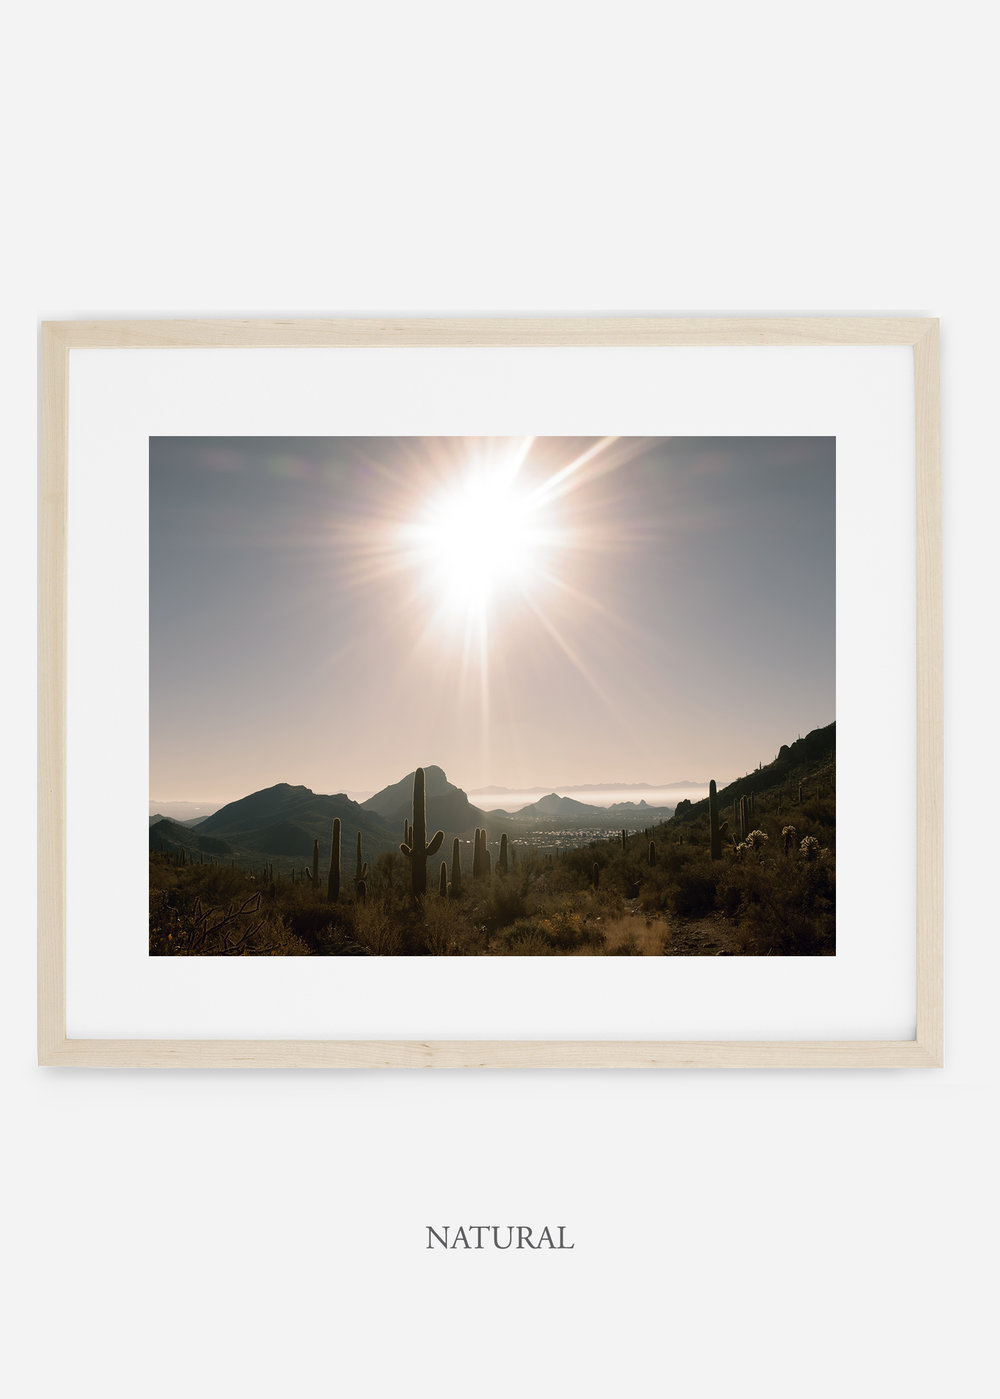 naturalframe-saguaroNo.15-wildercalifornia-art-wallart-cactusprint-homedecor-prints-arizona-botanical-artwork-interiordesign.jpg